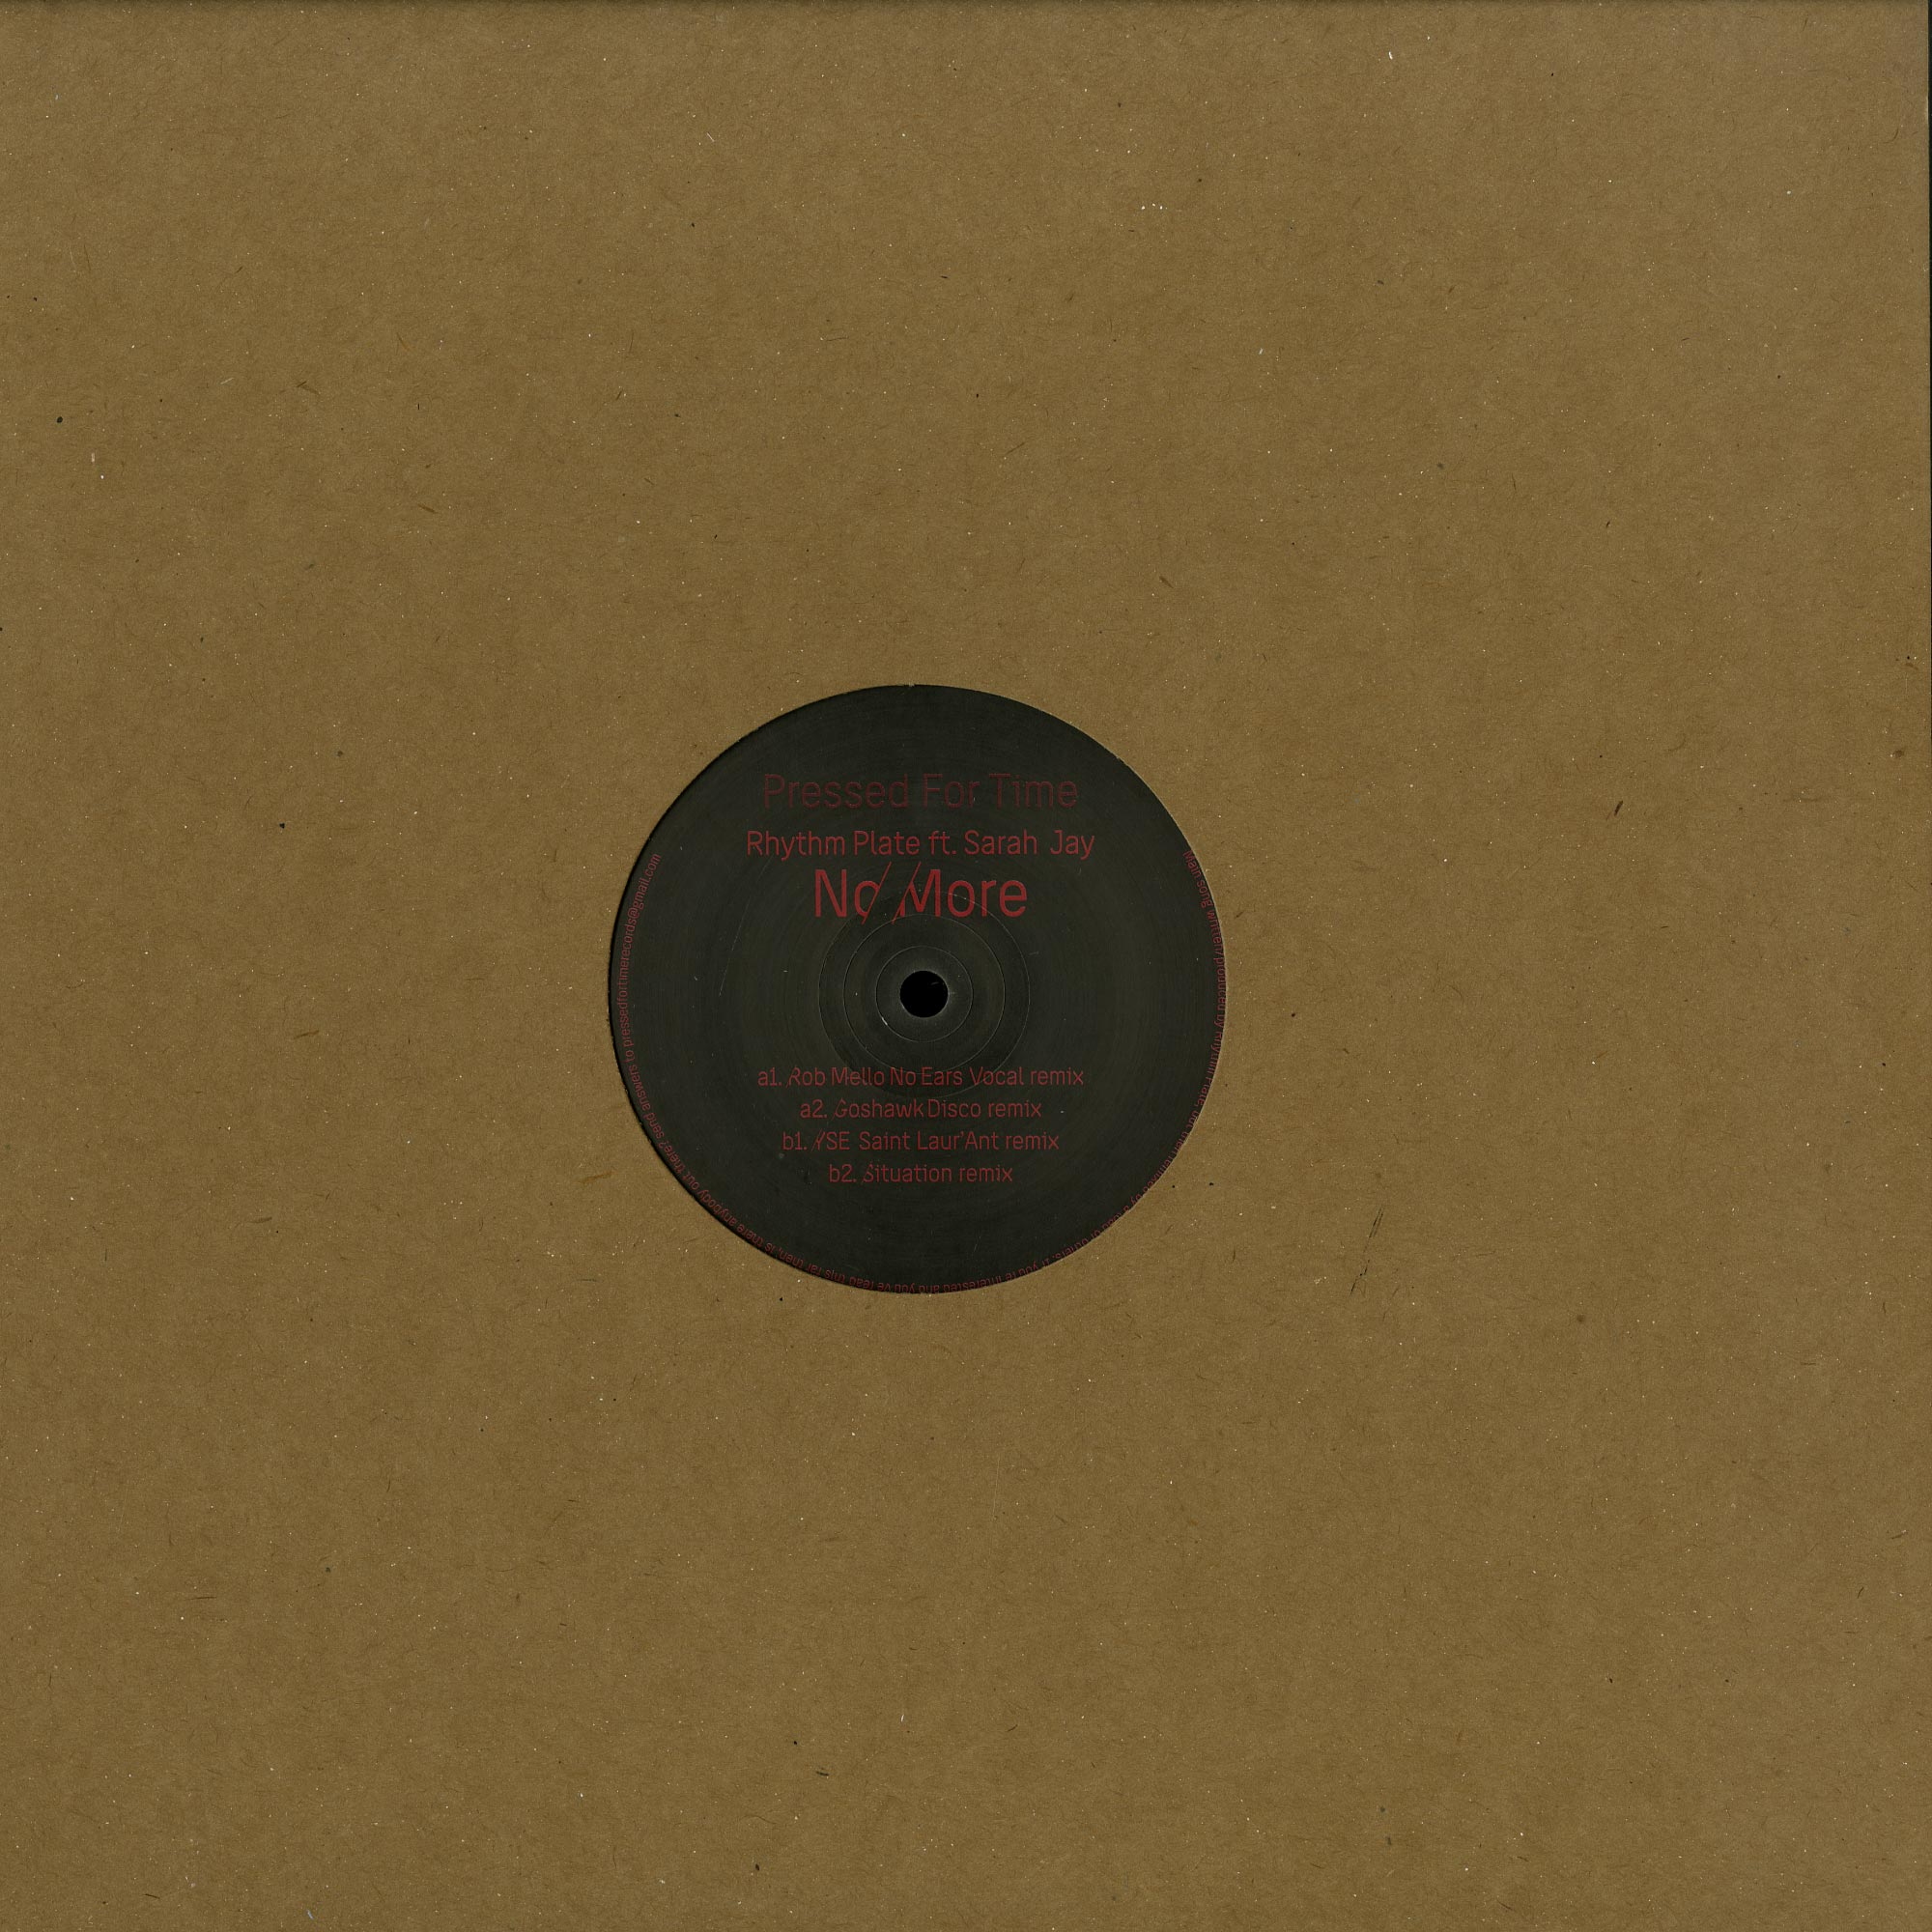 Rhythm Plate Feat. Sarah Jay - NO MORE PART 2